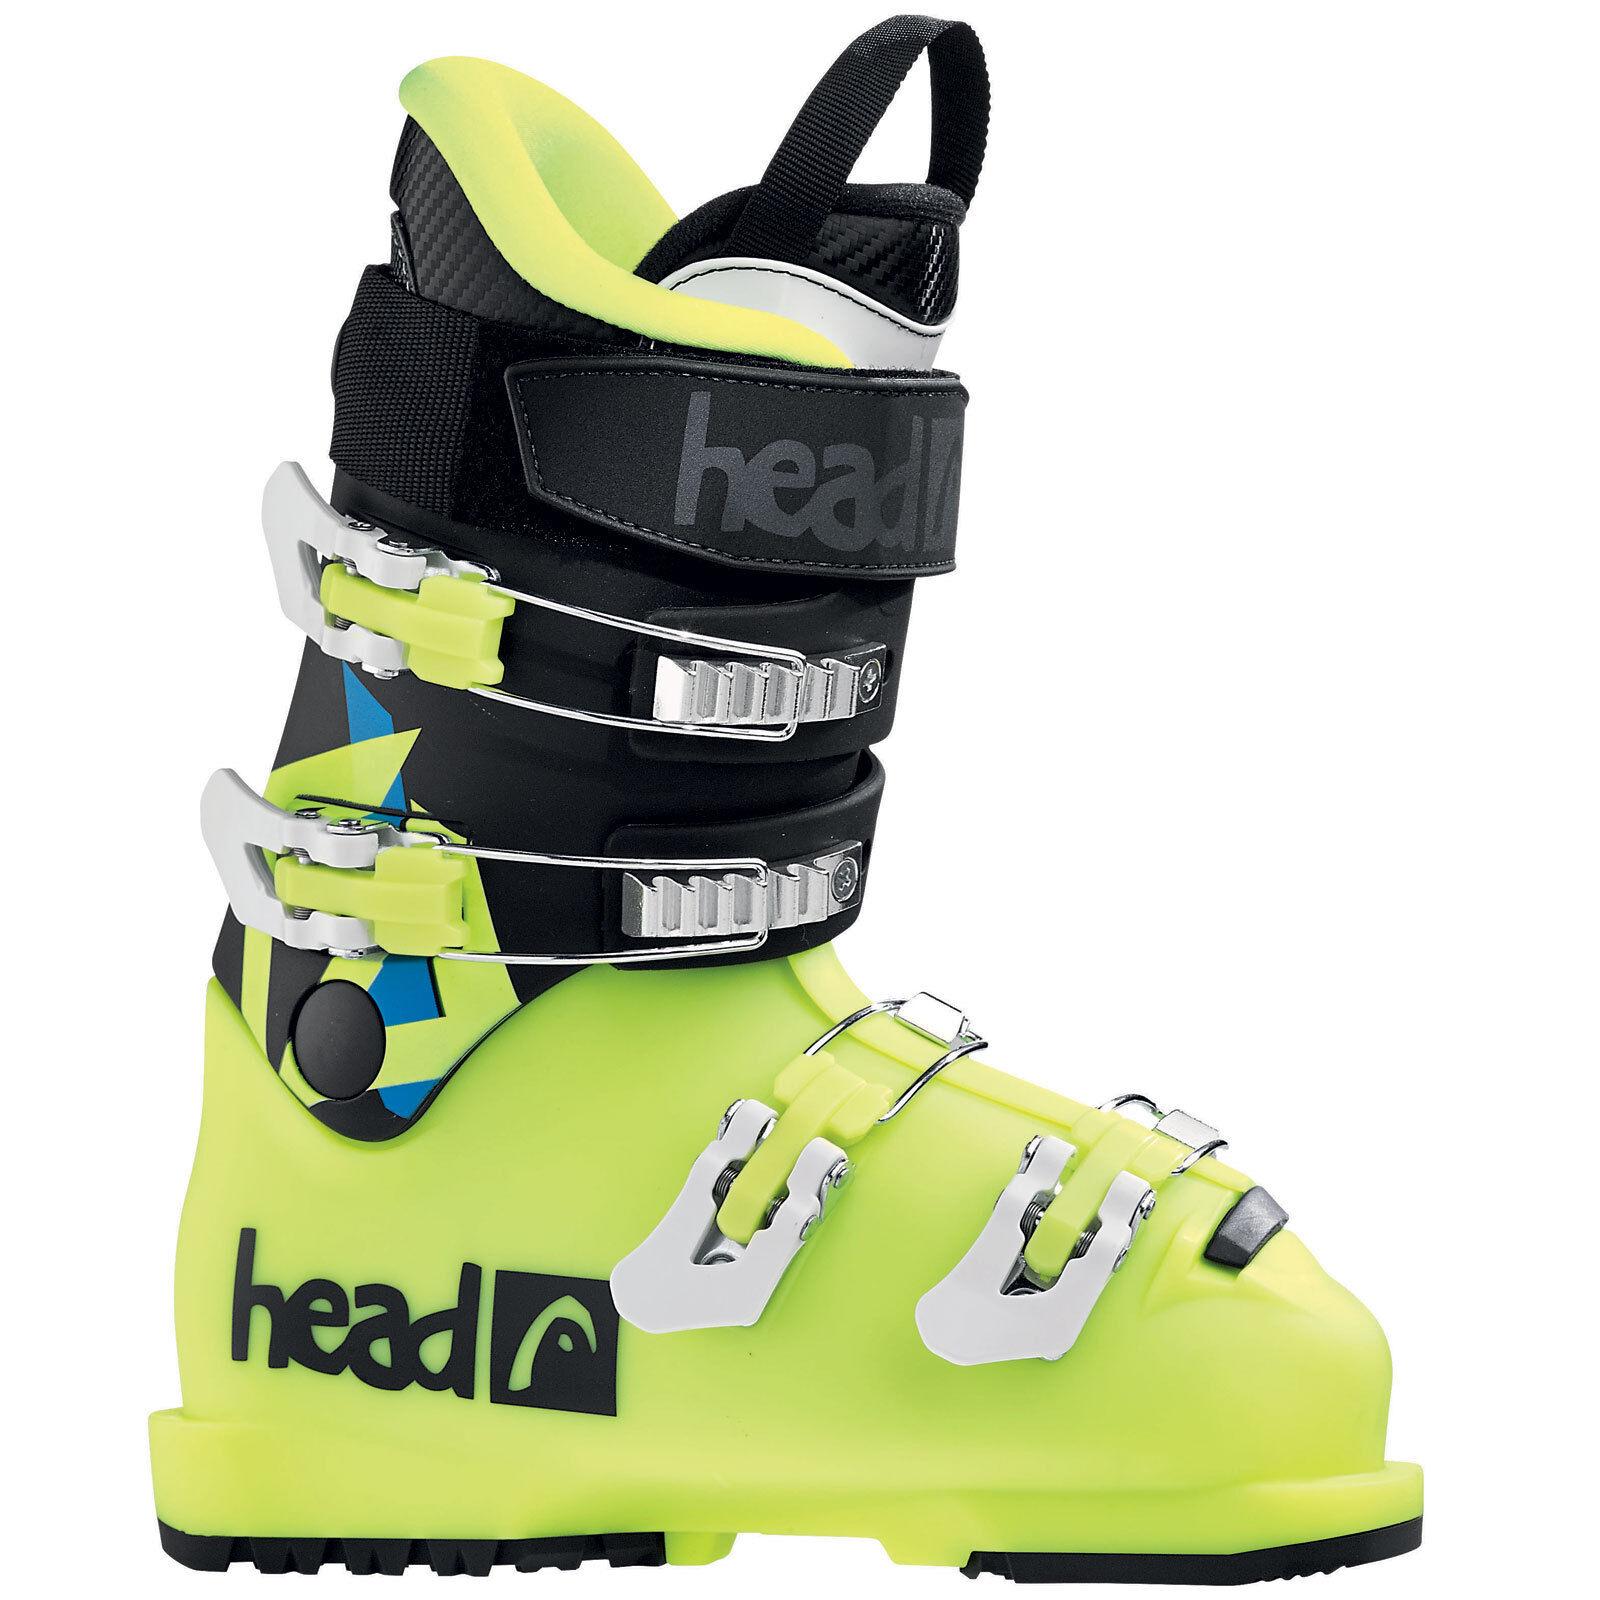 Head Raptor Stiefel Caddy 60 Junior Ski Stiefel Raptor Children's Ski Stiefel Stiefel Schuhes Ski Stiefel 64e914